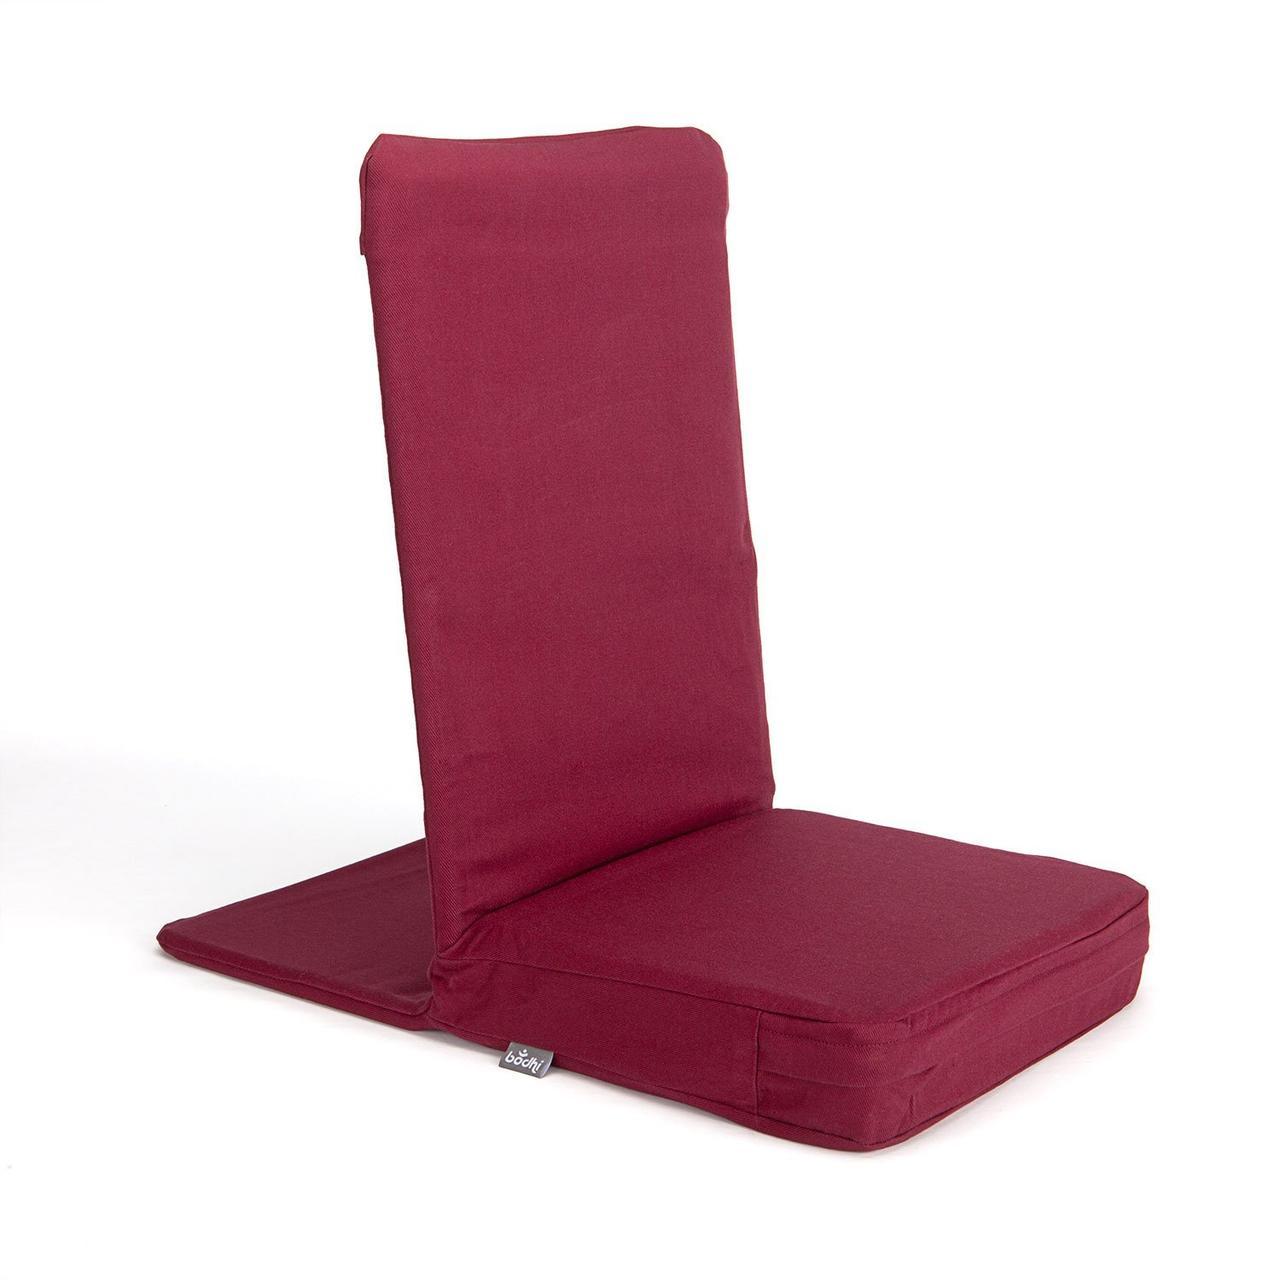 Кресло/стул для медитации Bodhi. Кресло для медитации Bodhi. - фото 2